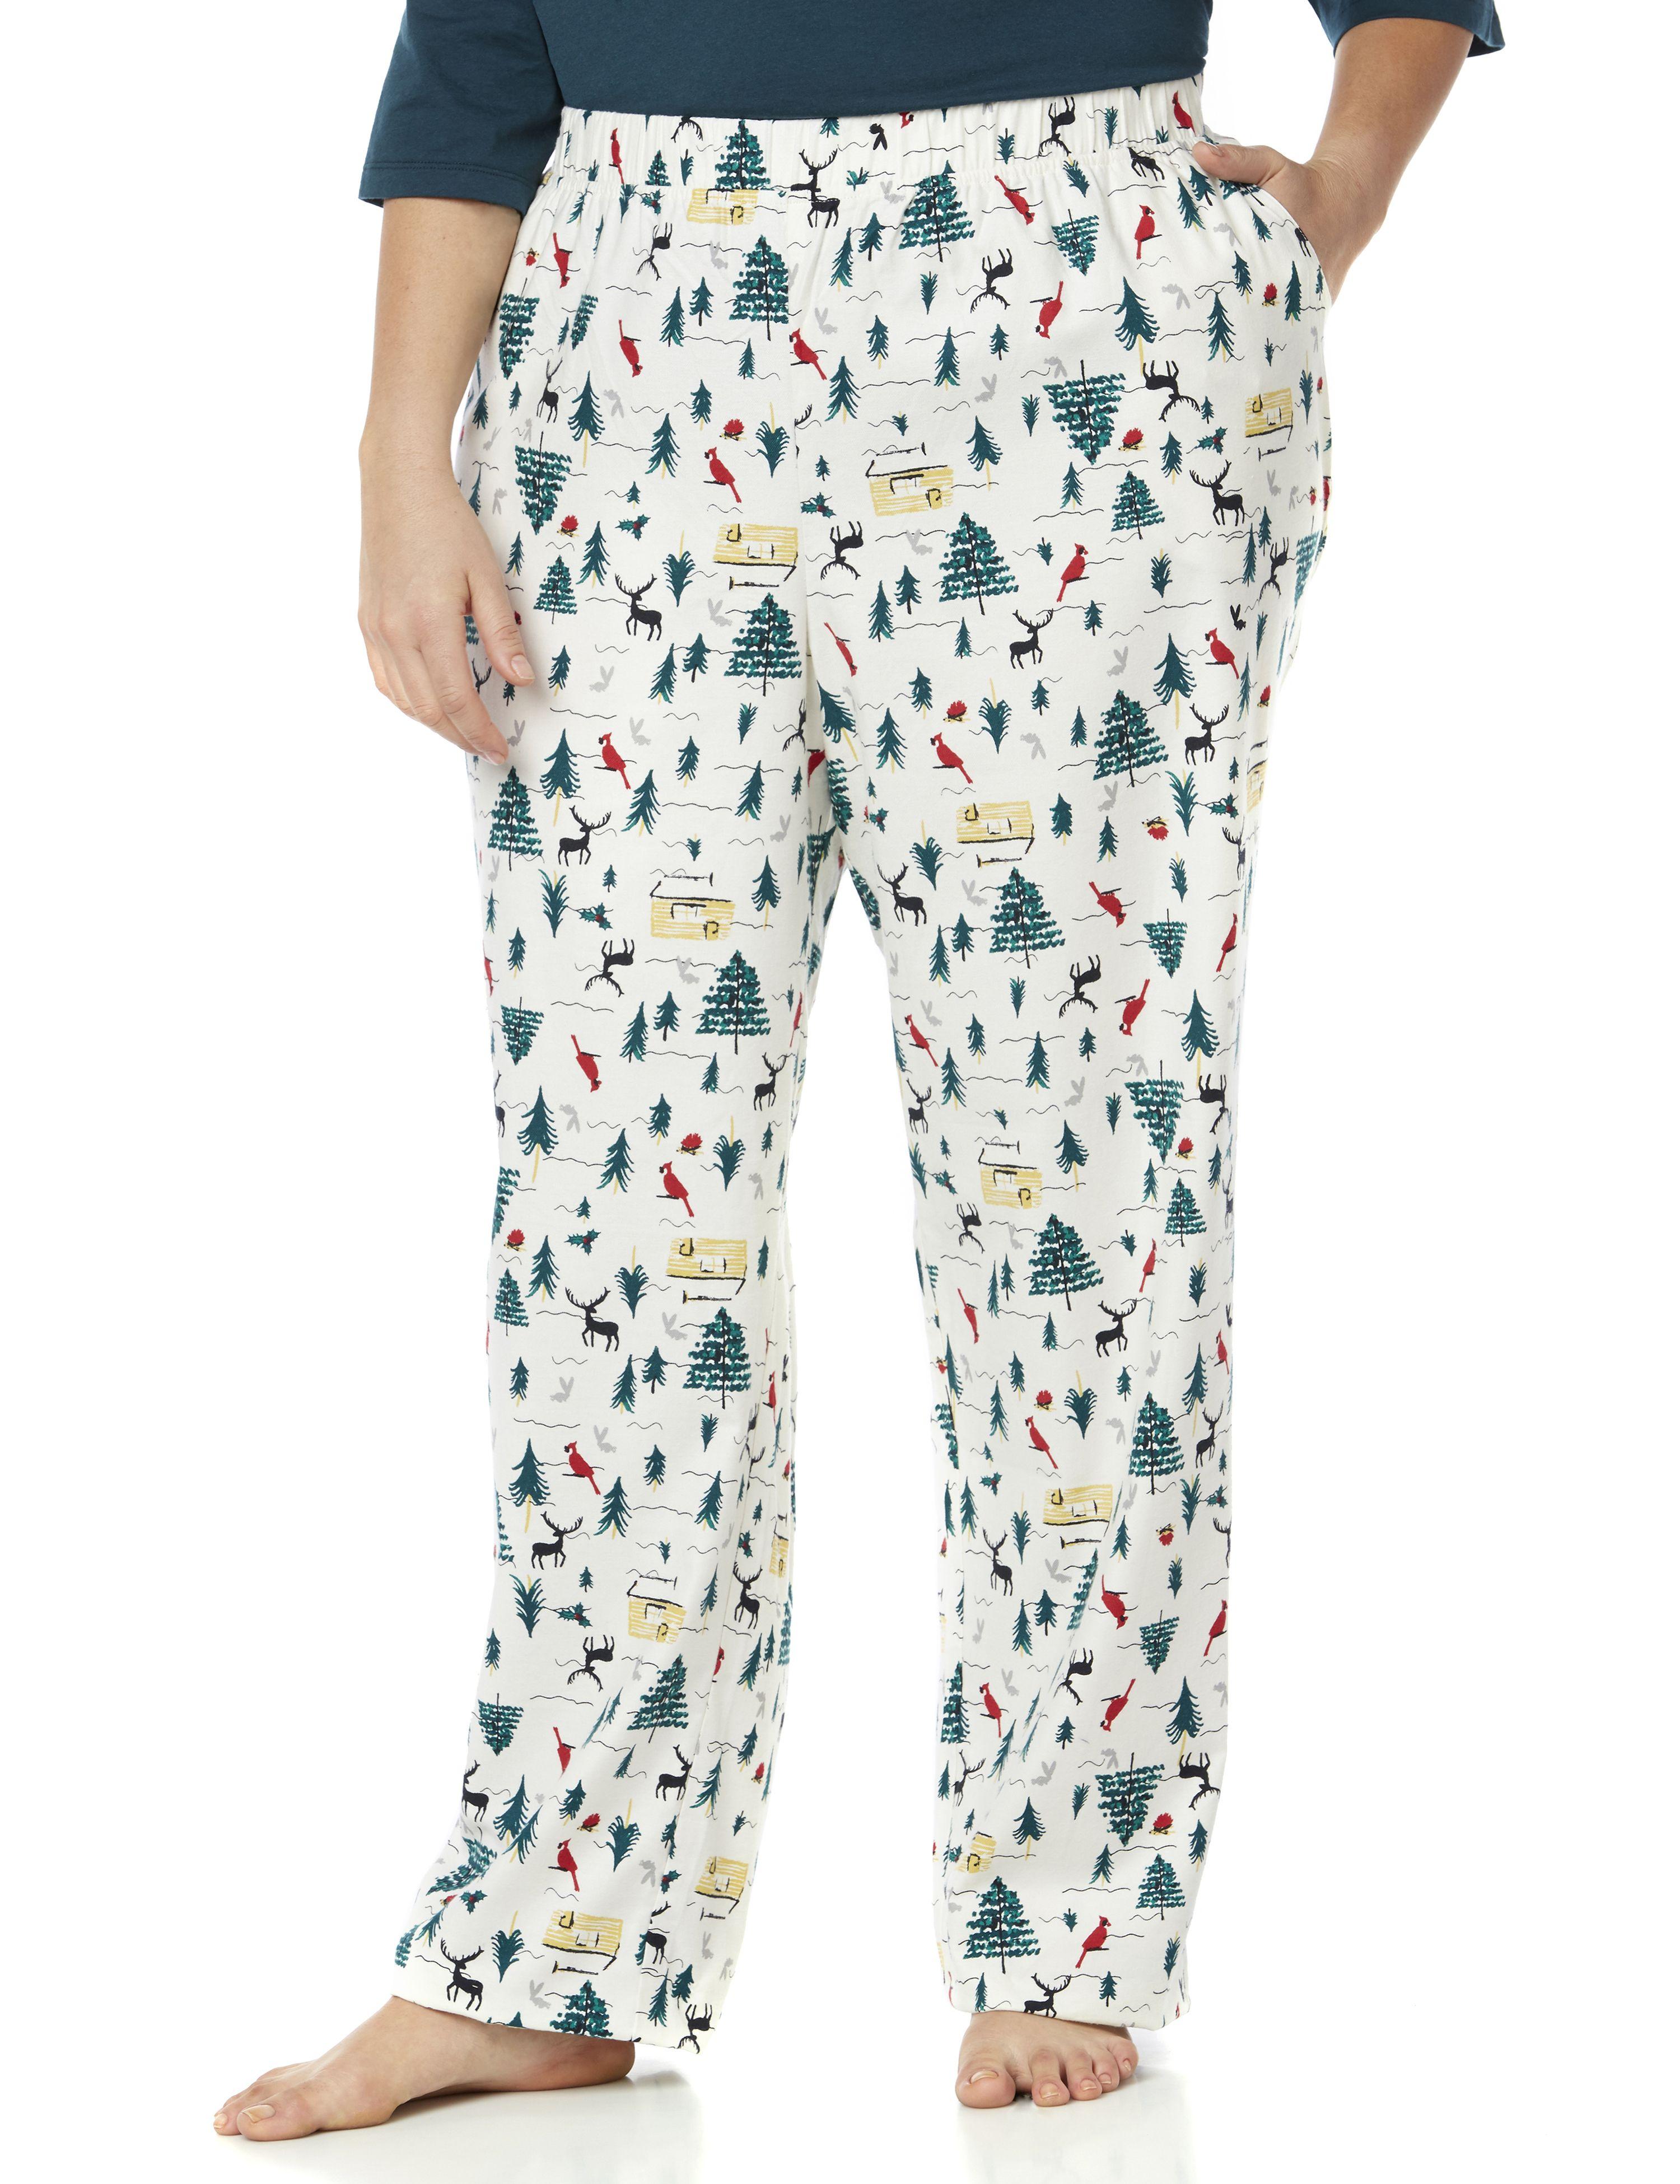 Winter Wonders Sleep Pant 1085154 Woven Flannel Pull on Pant MP-300089487